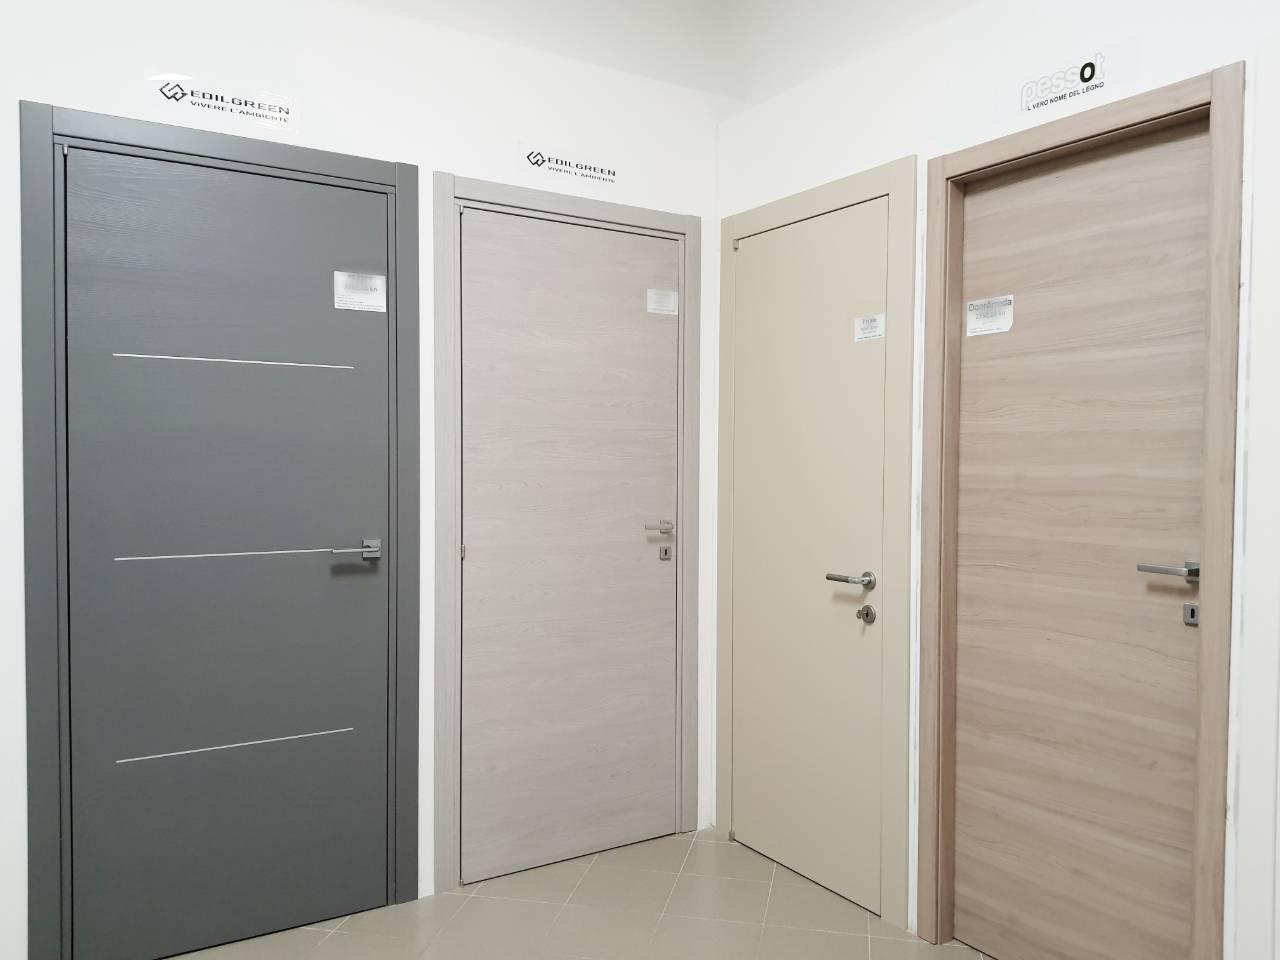 Ulazna i sobna vrata